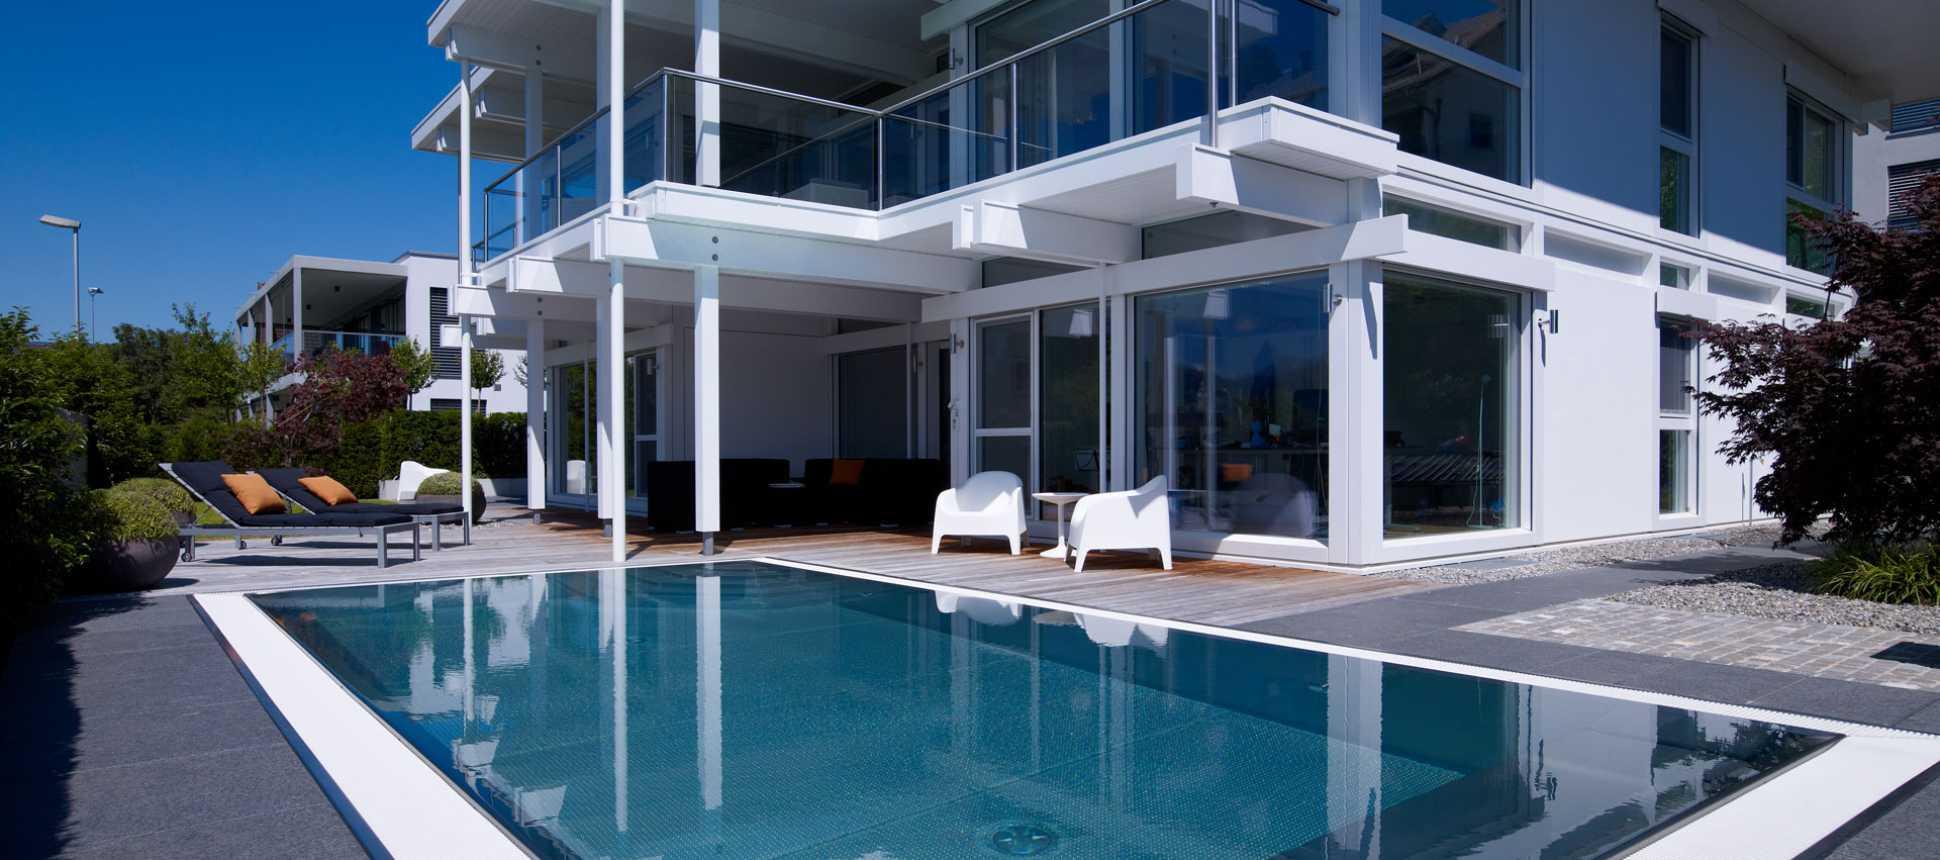 Edelstahl Swimmingpool Schwimmbad